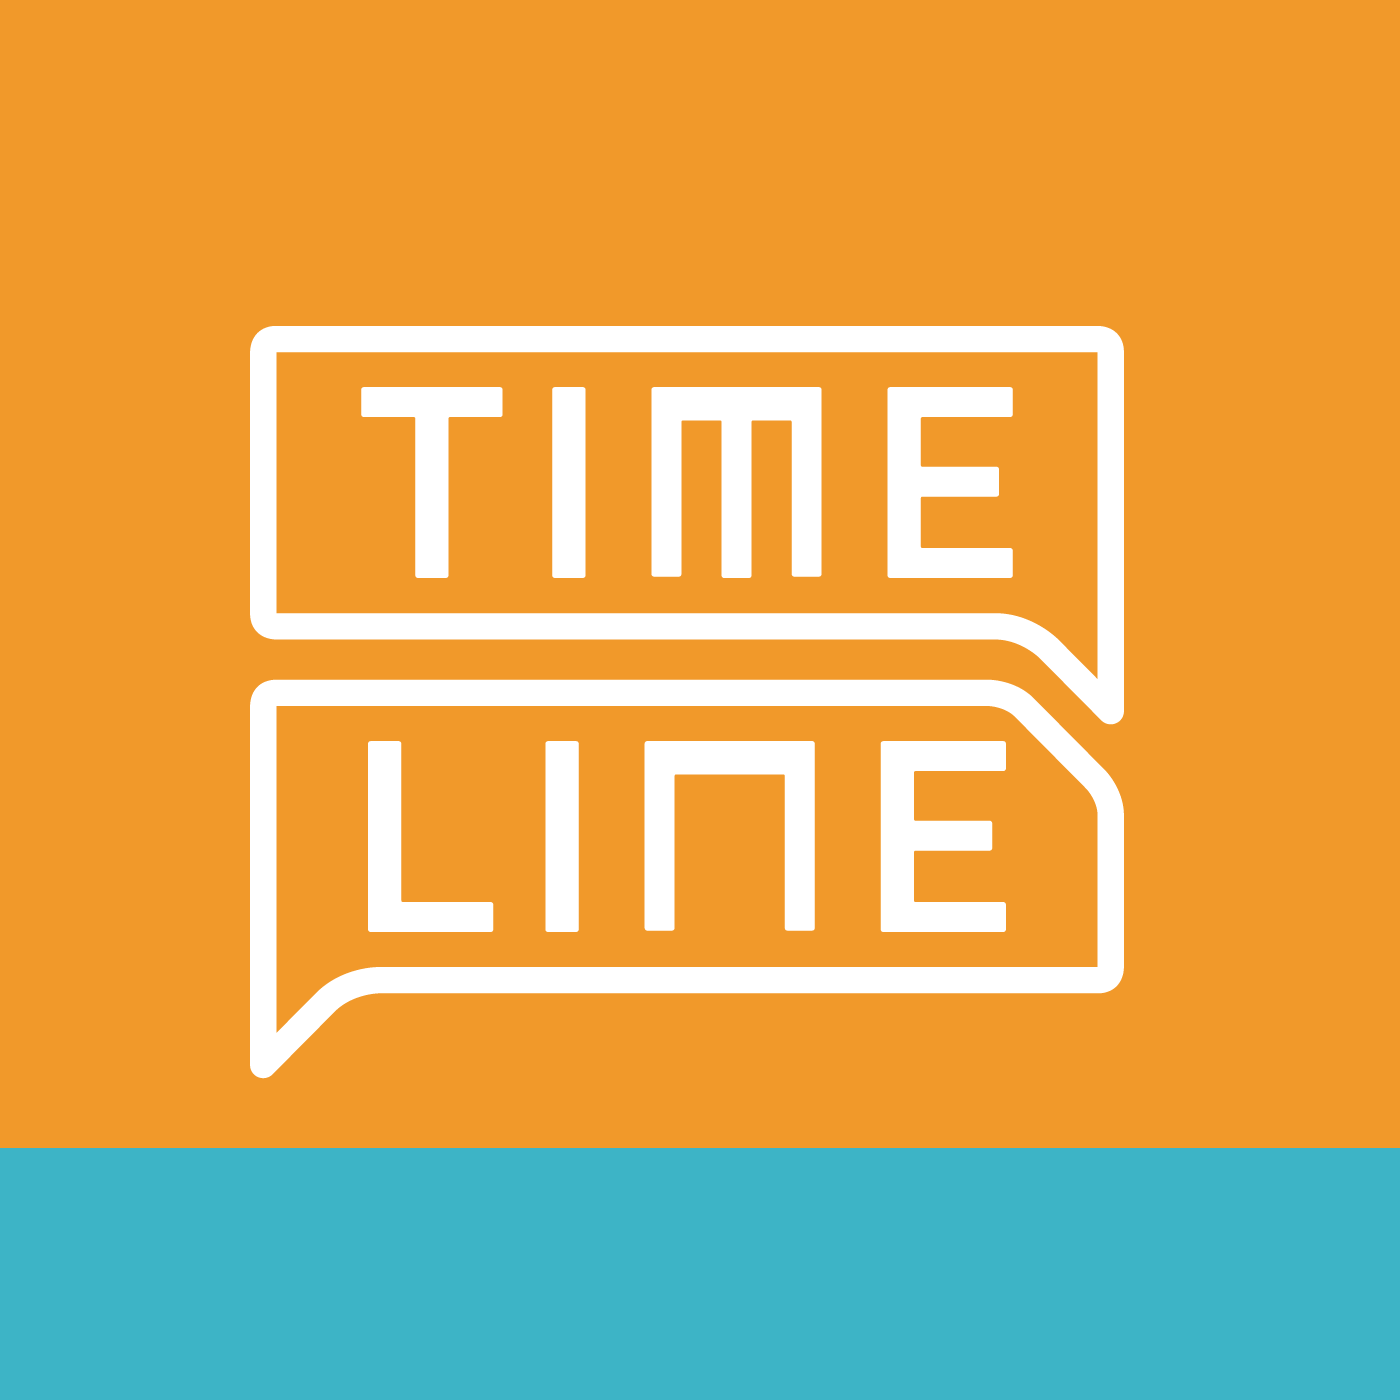 Timeline Gaúcha 20/03/2017